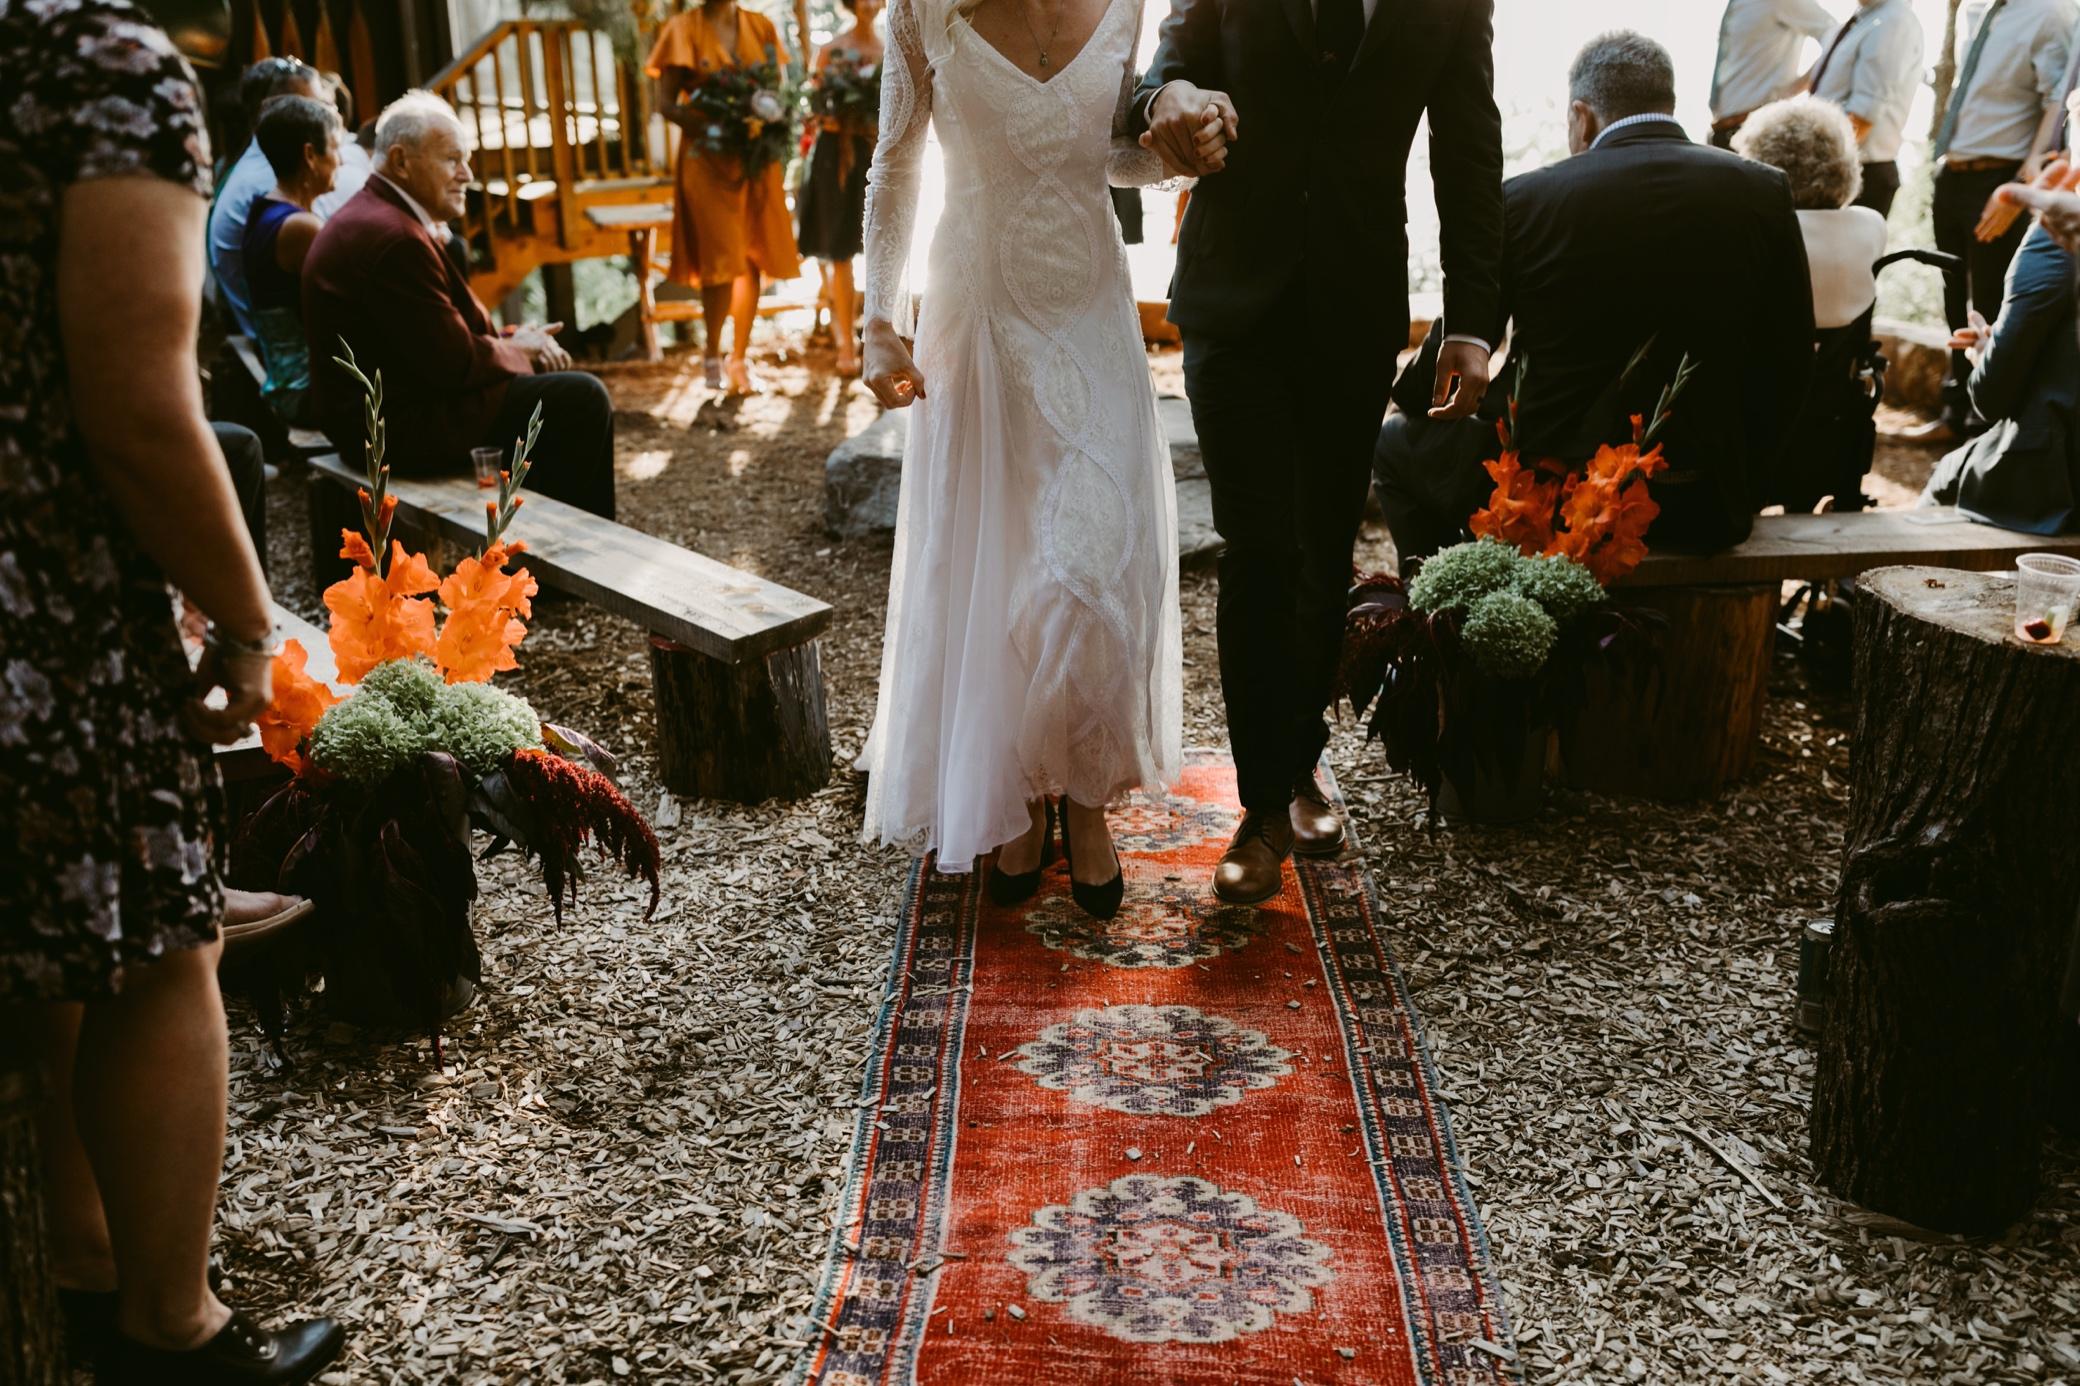 104_Huntsville Wedding  (489 of 689)_Ontario_Cottage_Huntsville_Wedding.jpg